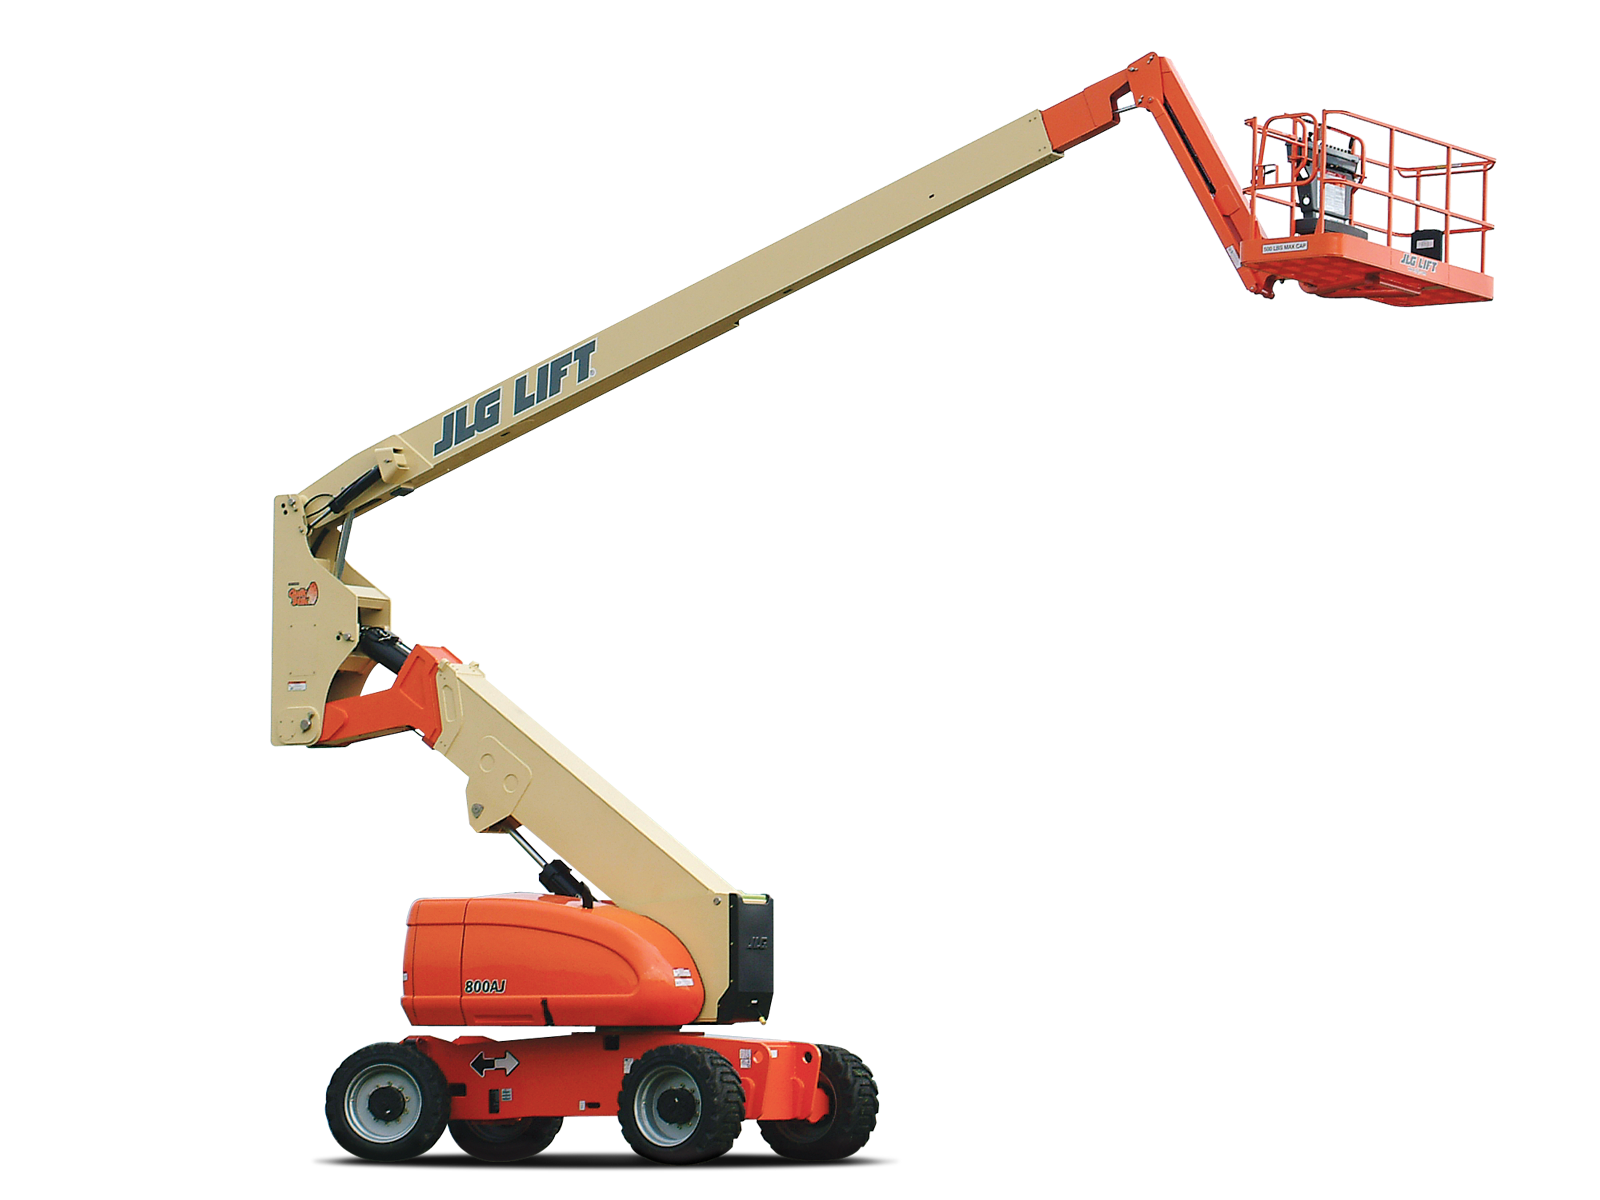 800aj articulating boom lift jlg rh jlg com